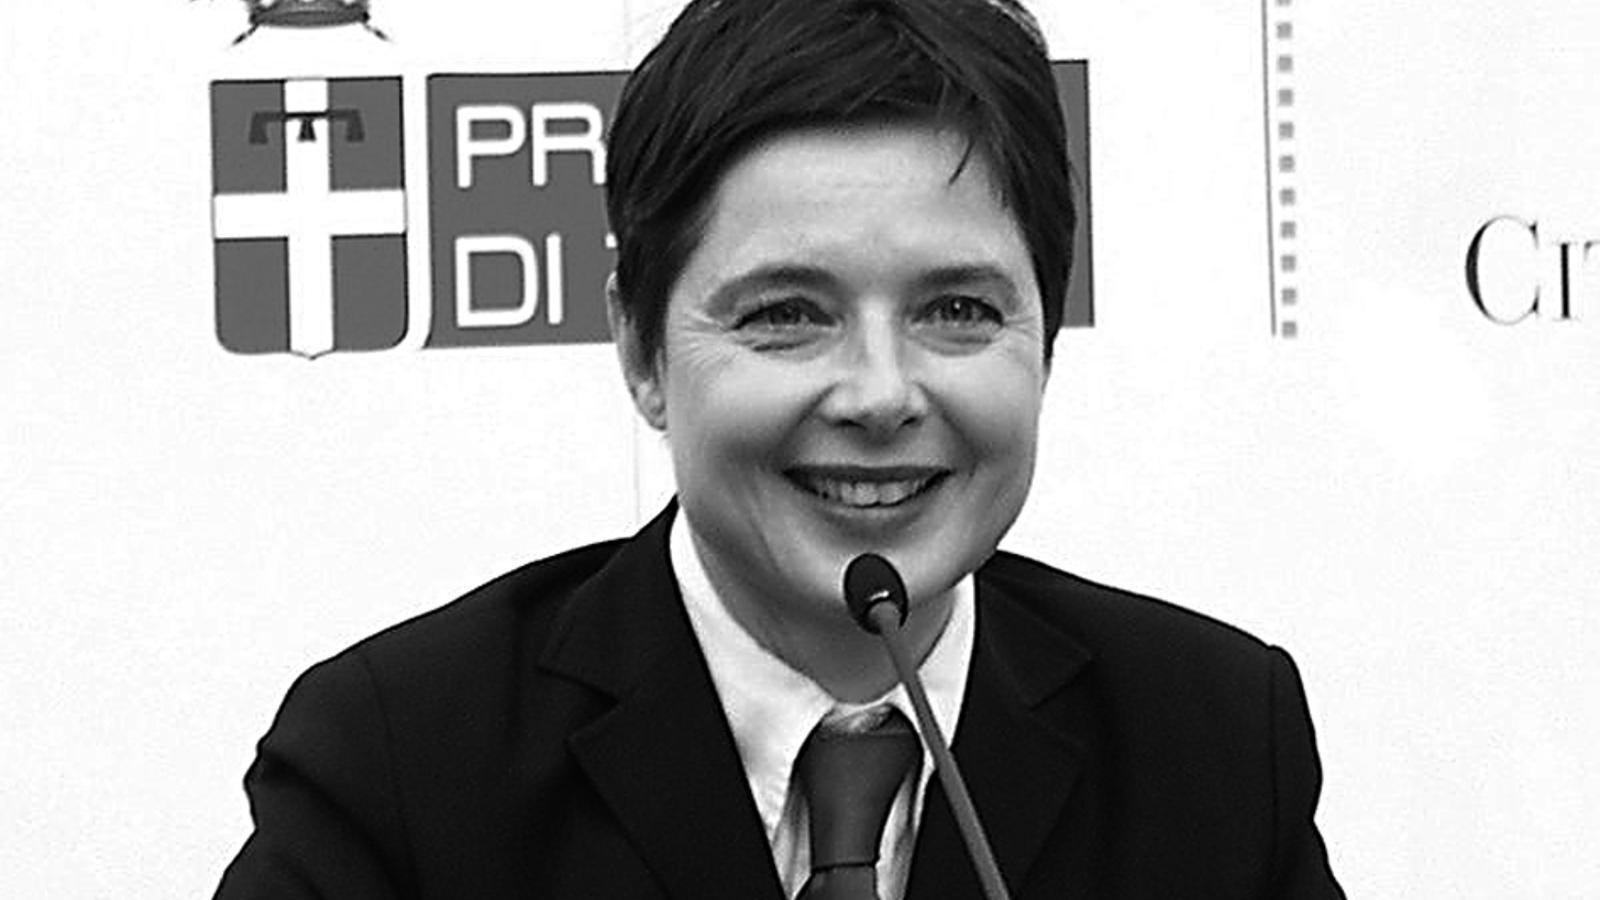 Isabella Rossellini / LAURA CINEMA